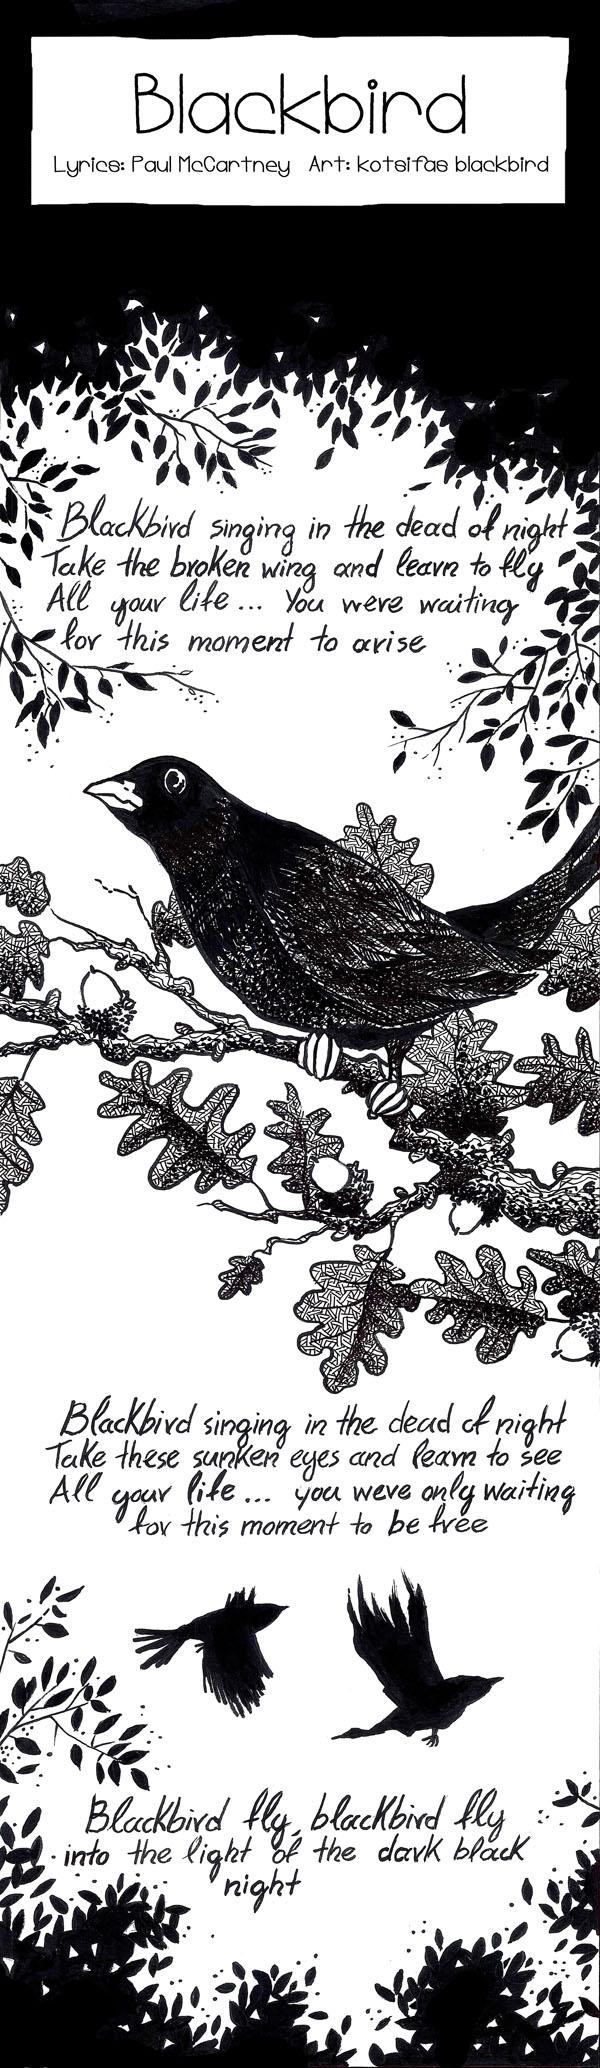 blackbird socomic